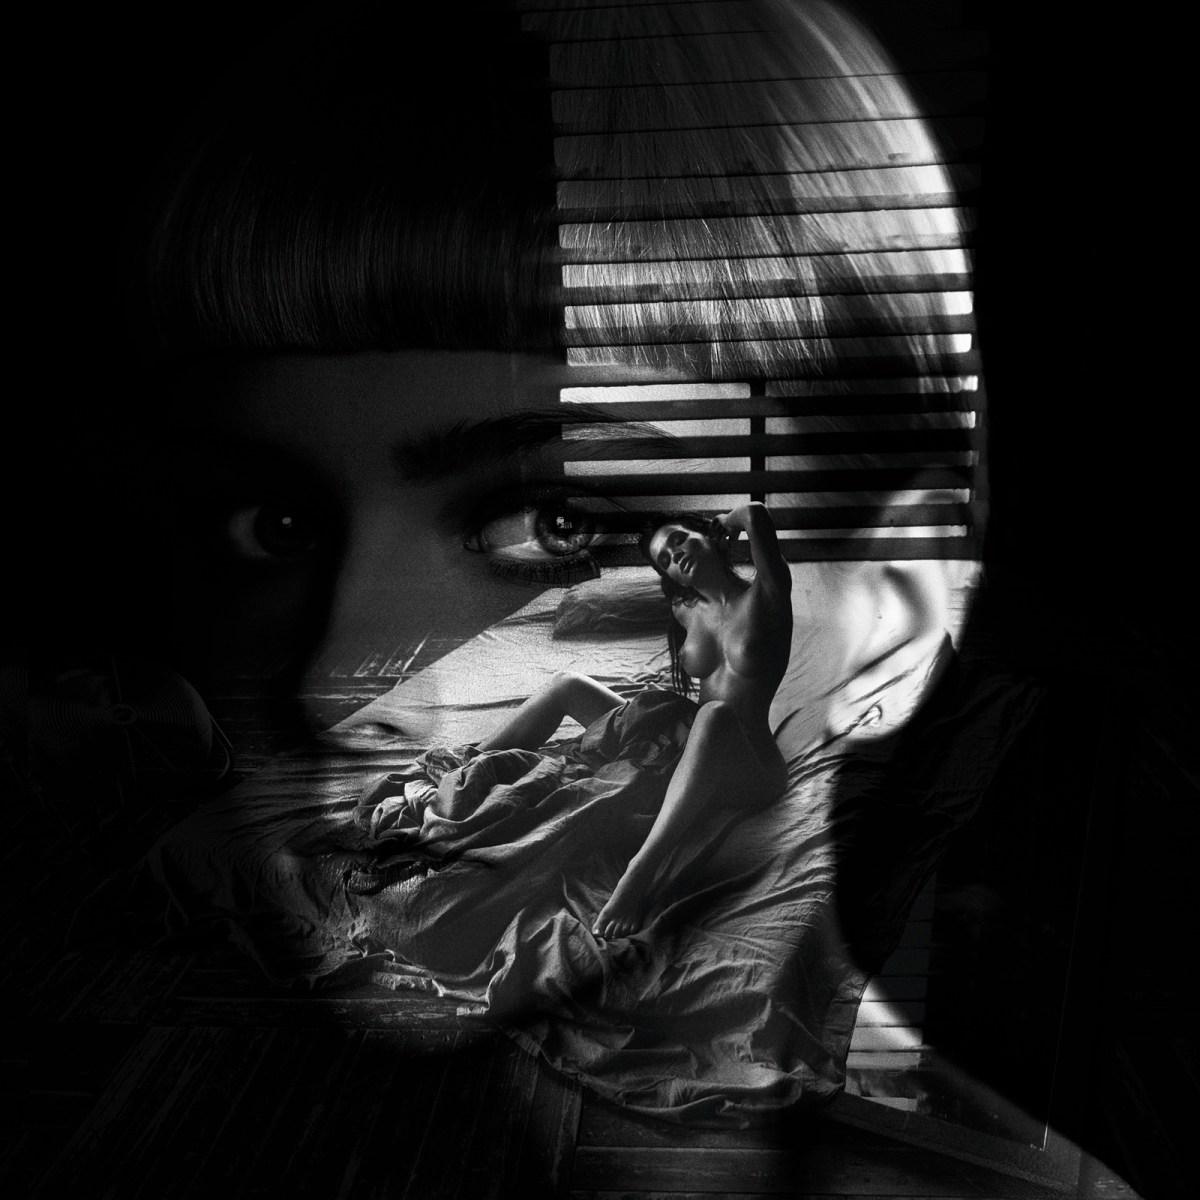 Noir Stories by Vladislav Spivak